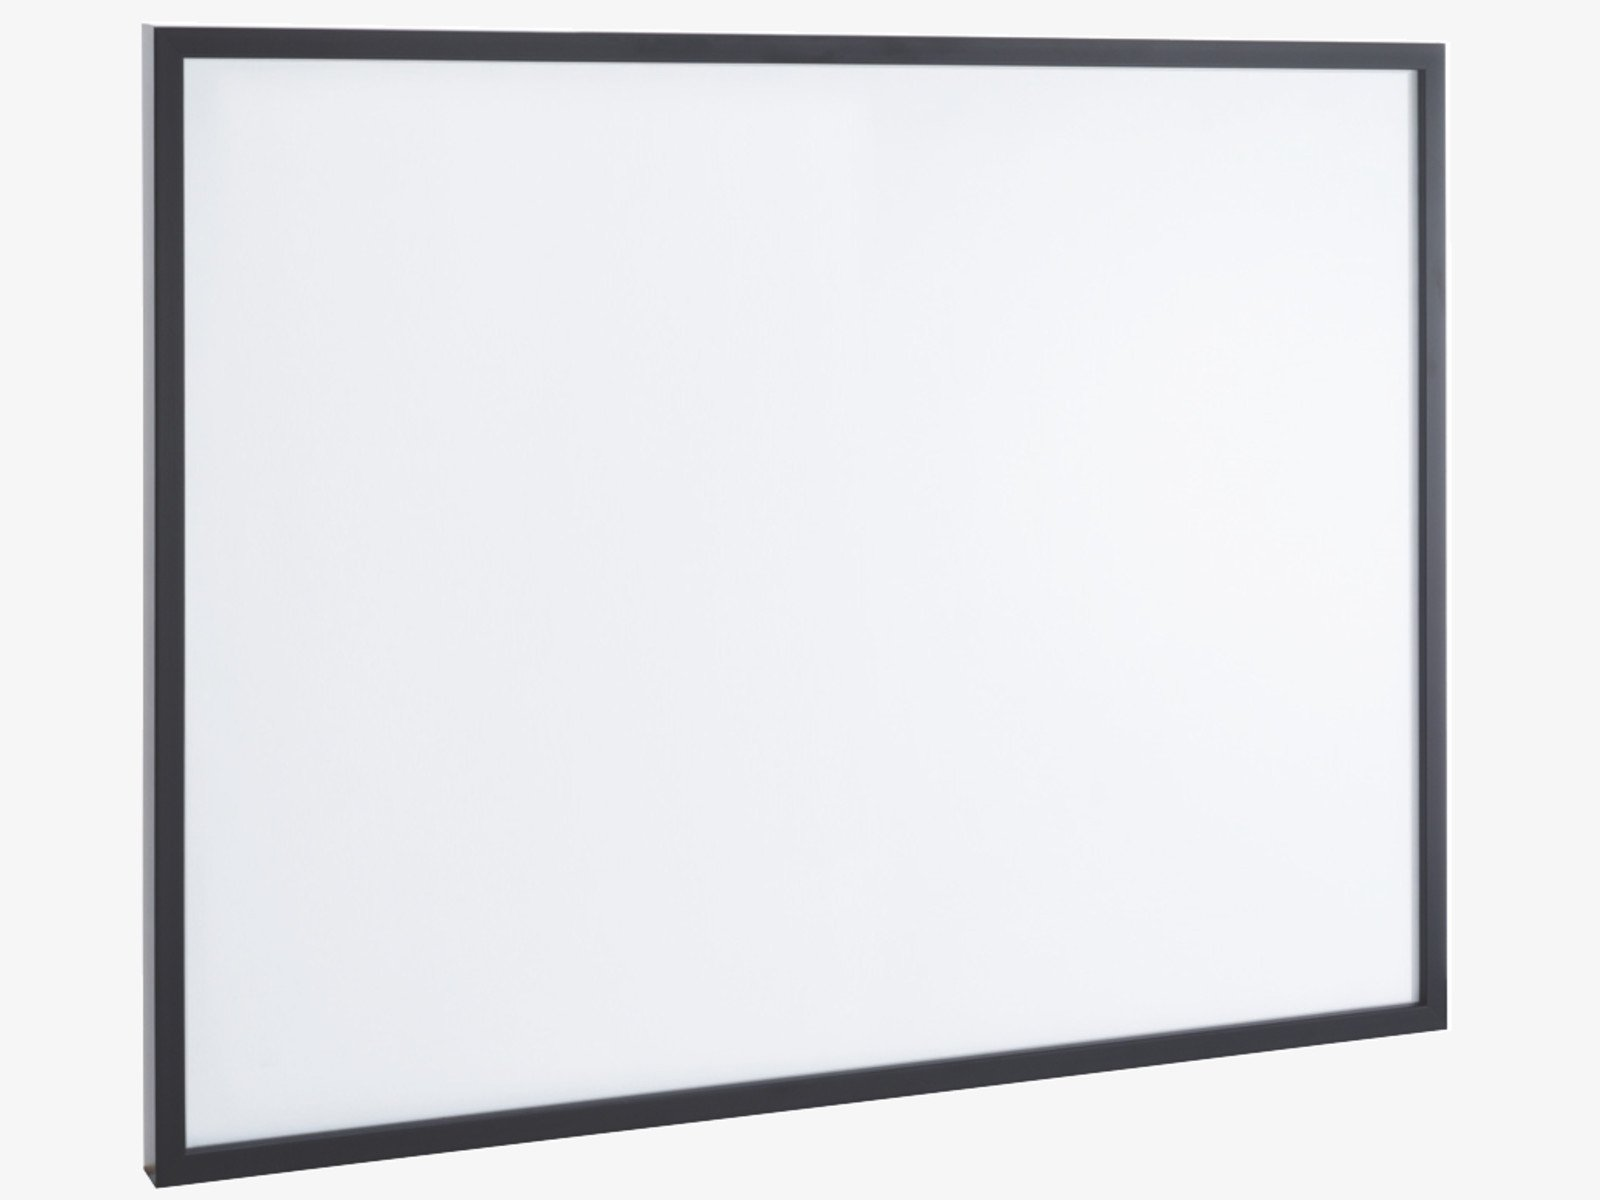 Image of Habitat 60x80cm Wall Frame - Dark Birch.